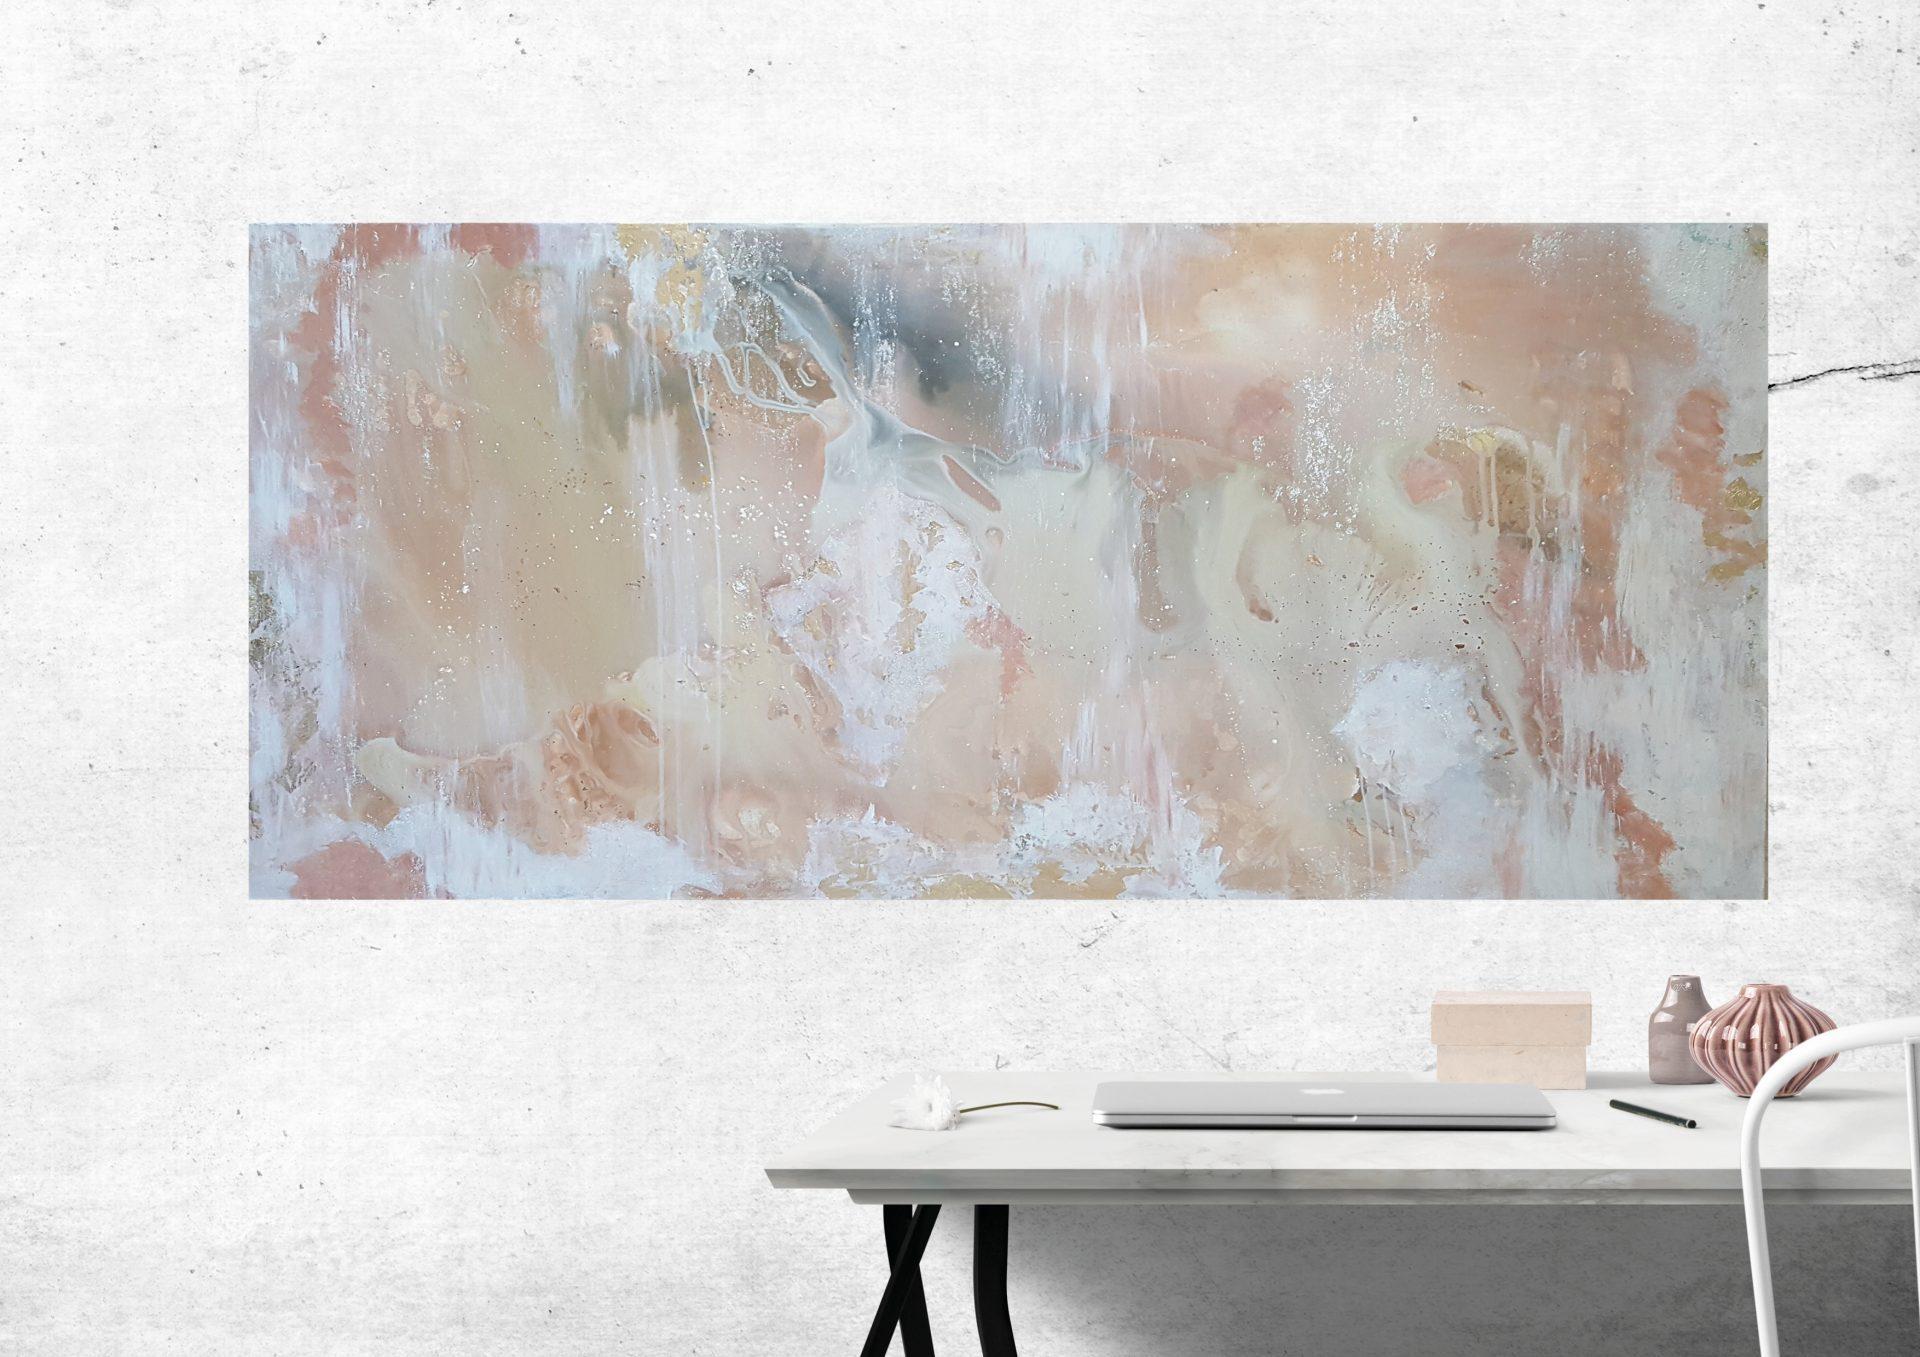 Abstrakt maleri jord farver